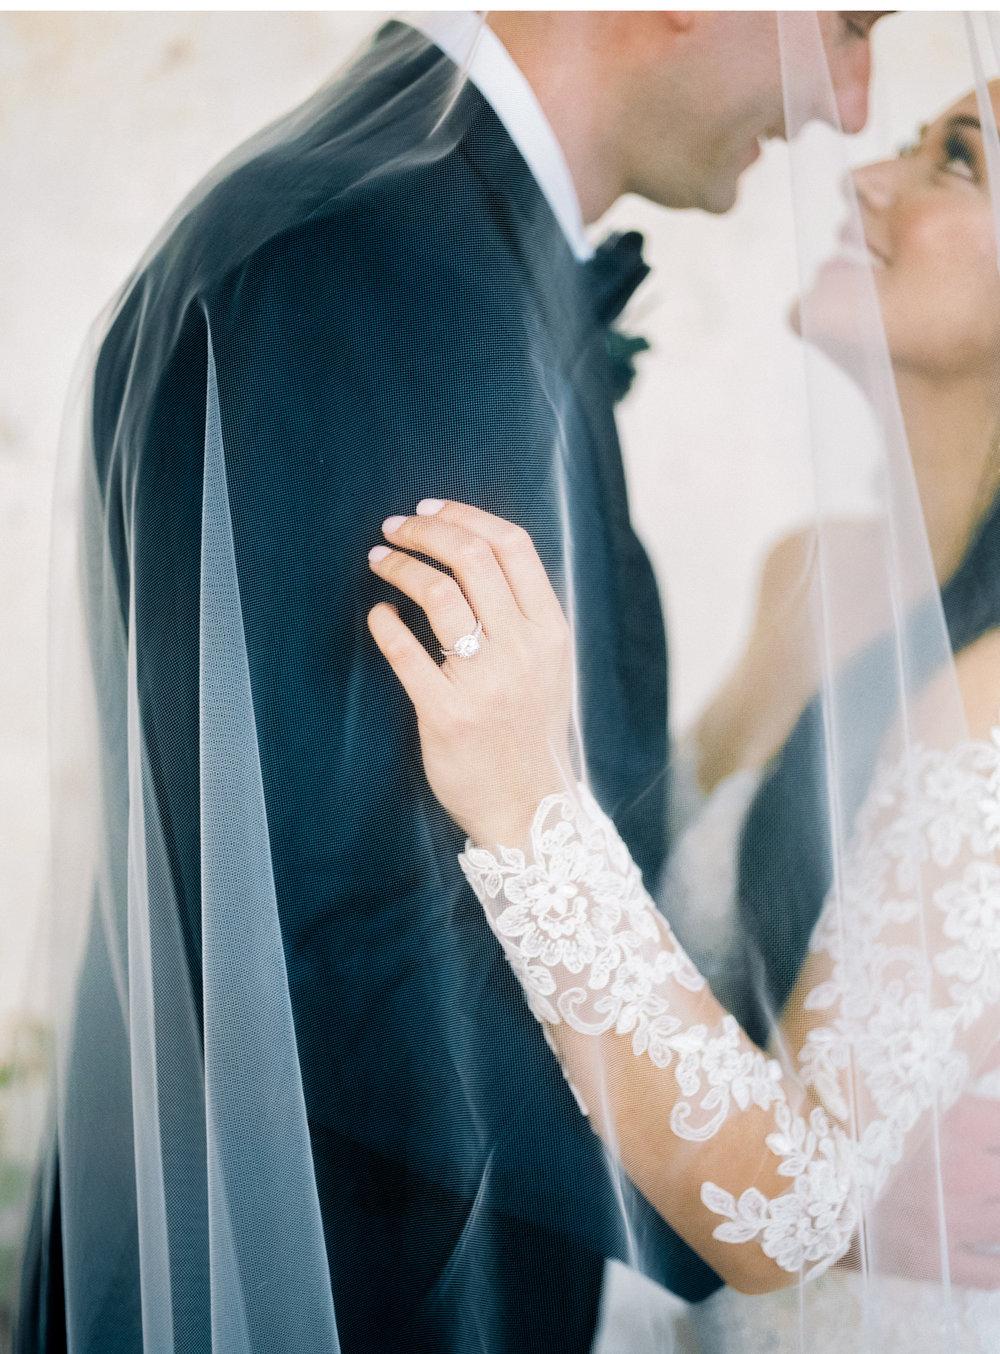 Malibu-Weddings-Natalie-Schutt-Photography_03.jpg